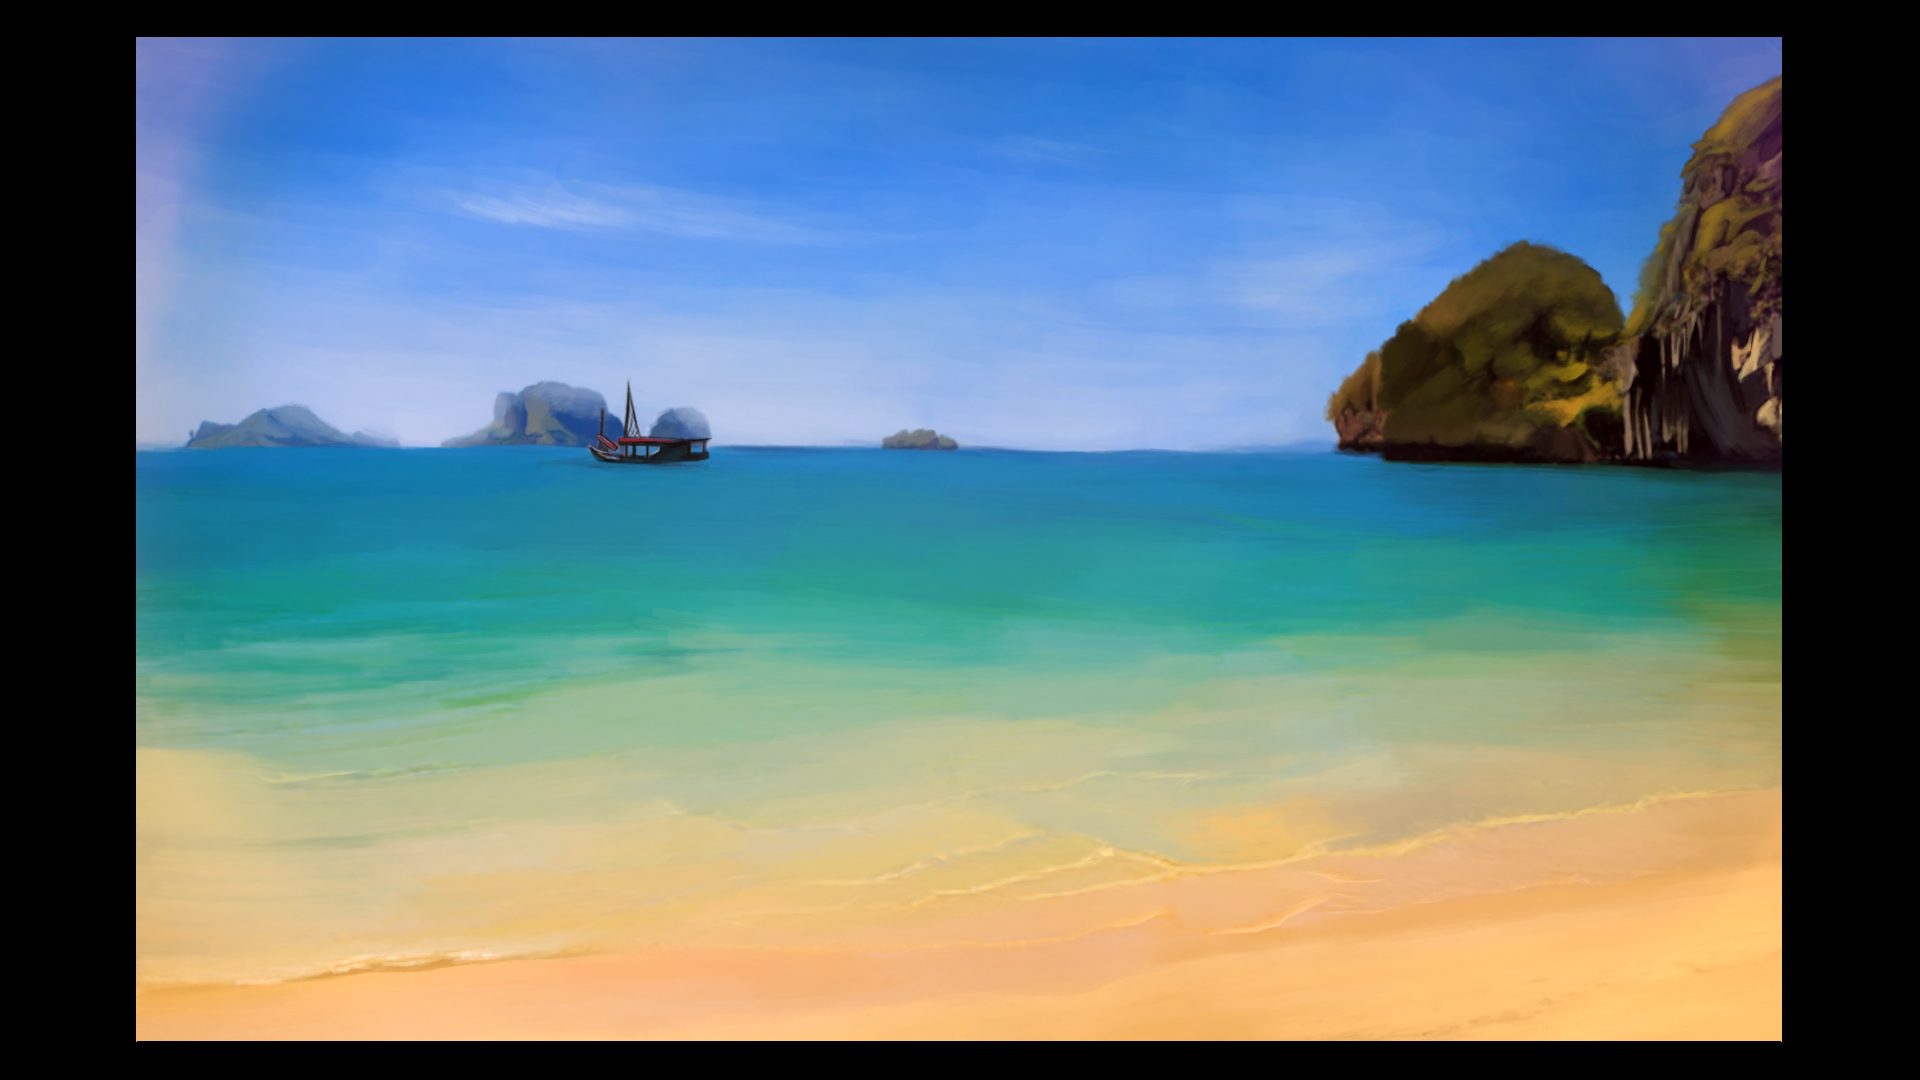 Beach - Cartoon Painting